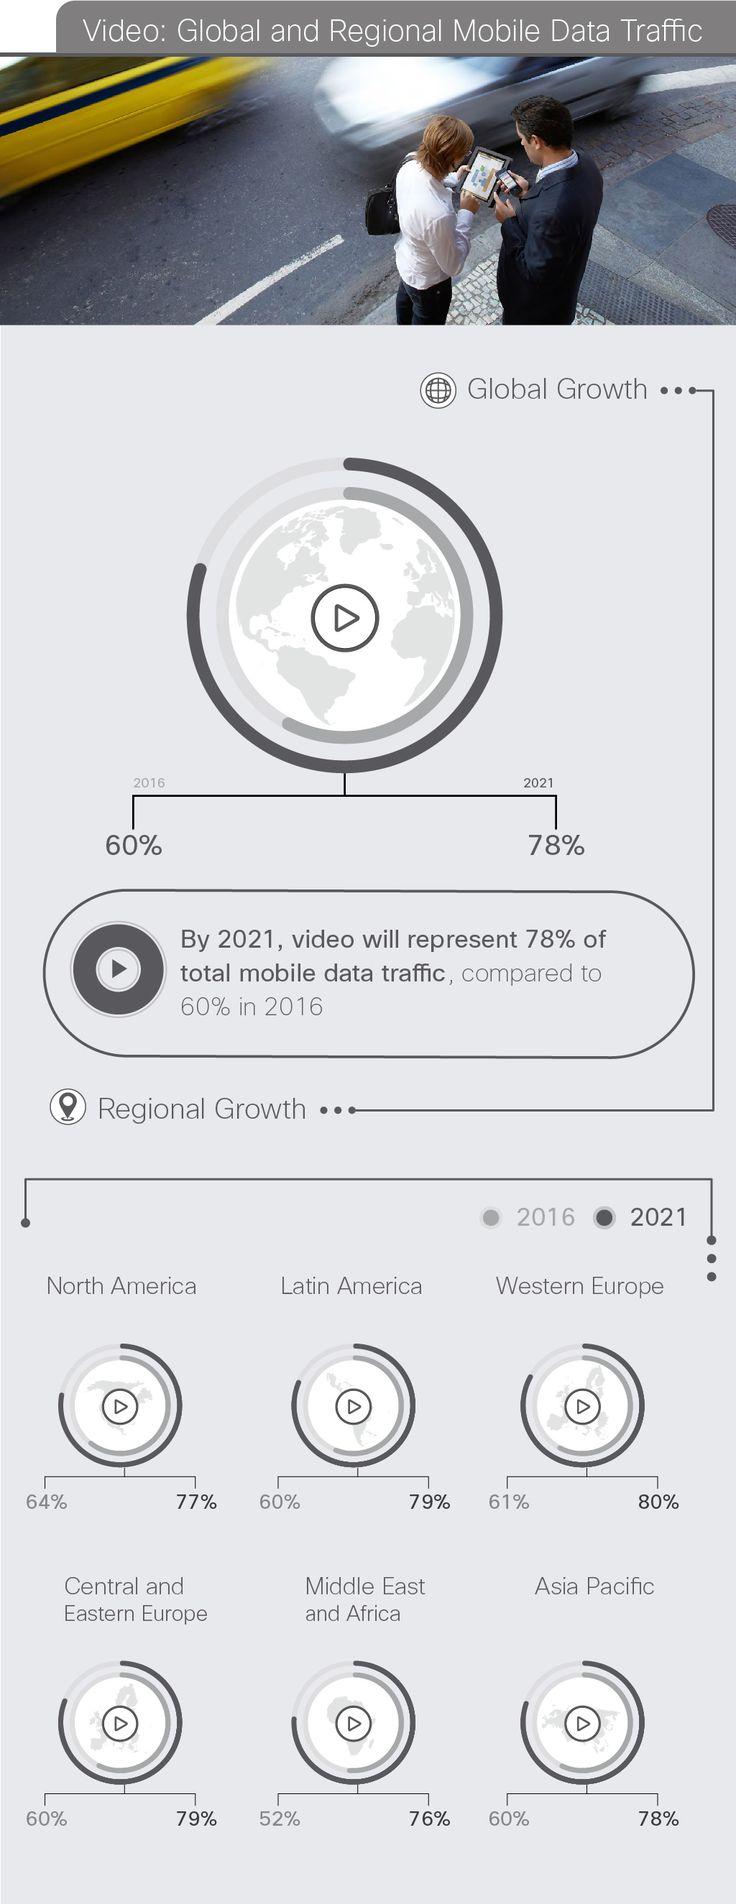 Video: Global and Regional Mobile Data Traffic #mobiledata